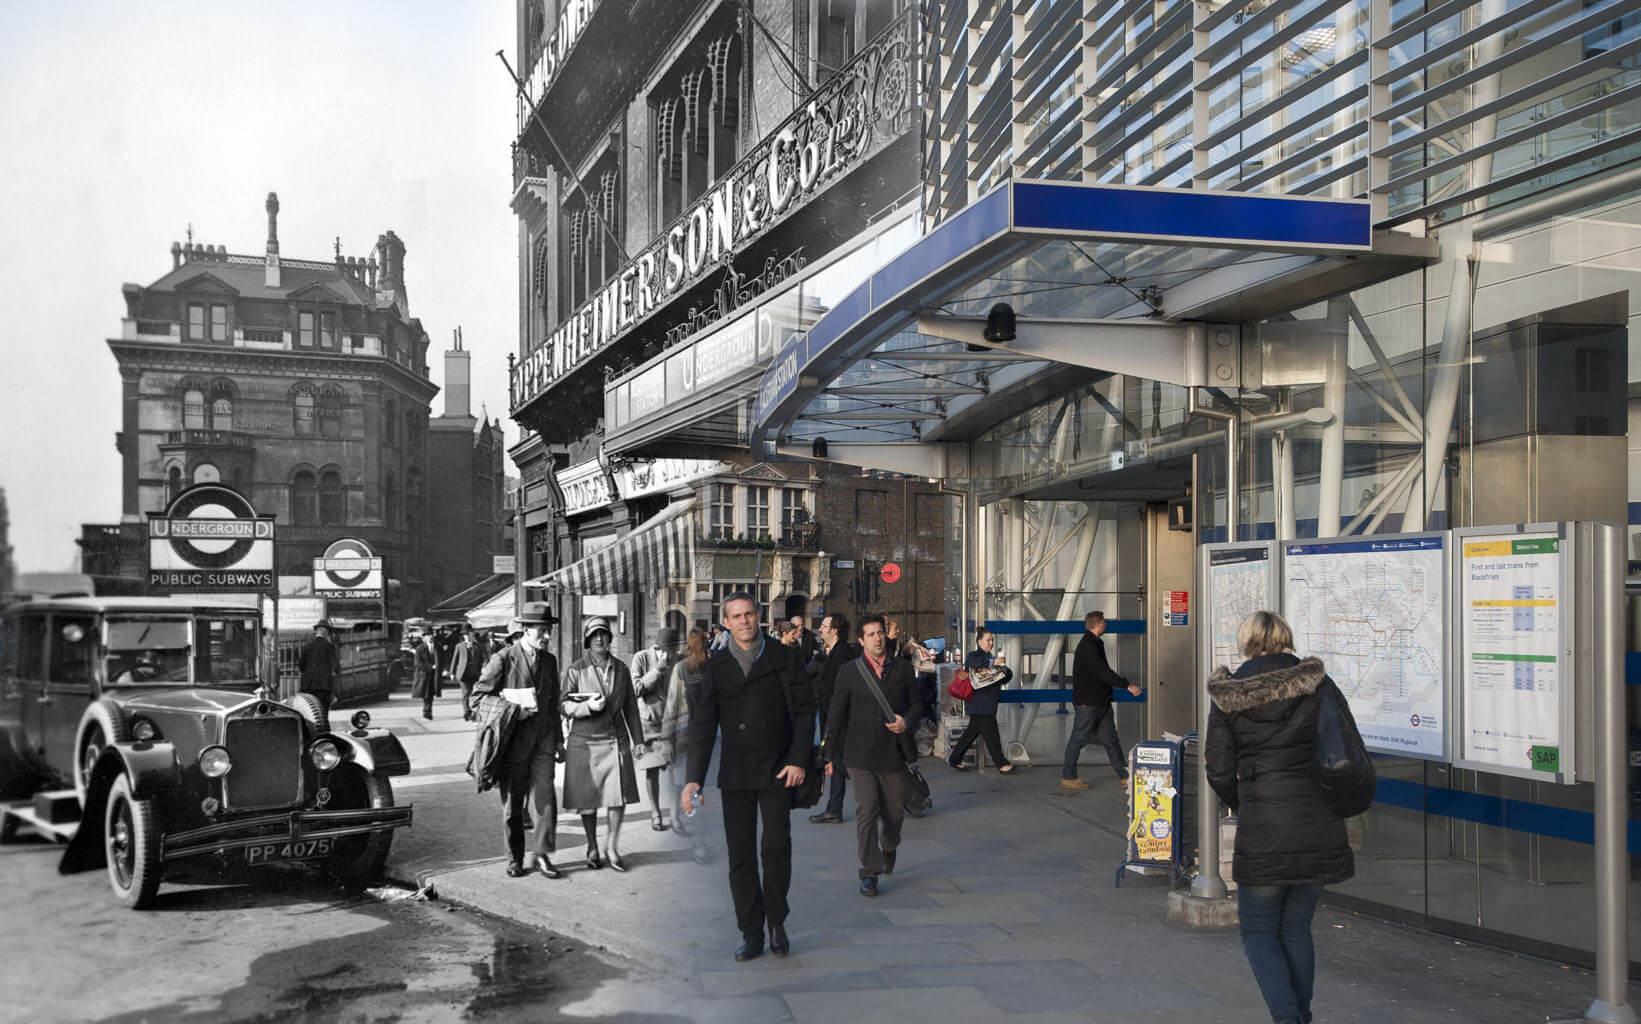 4b3abd50-9eca-11e3-85ab-cdbd2a0ac128_6-Blackfriars-station-c-1930-2014-Museum-of-London